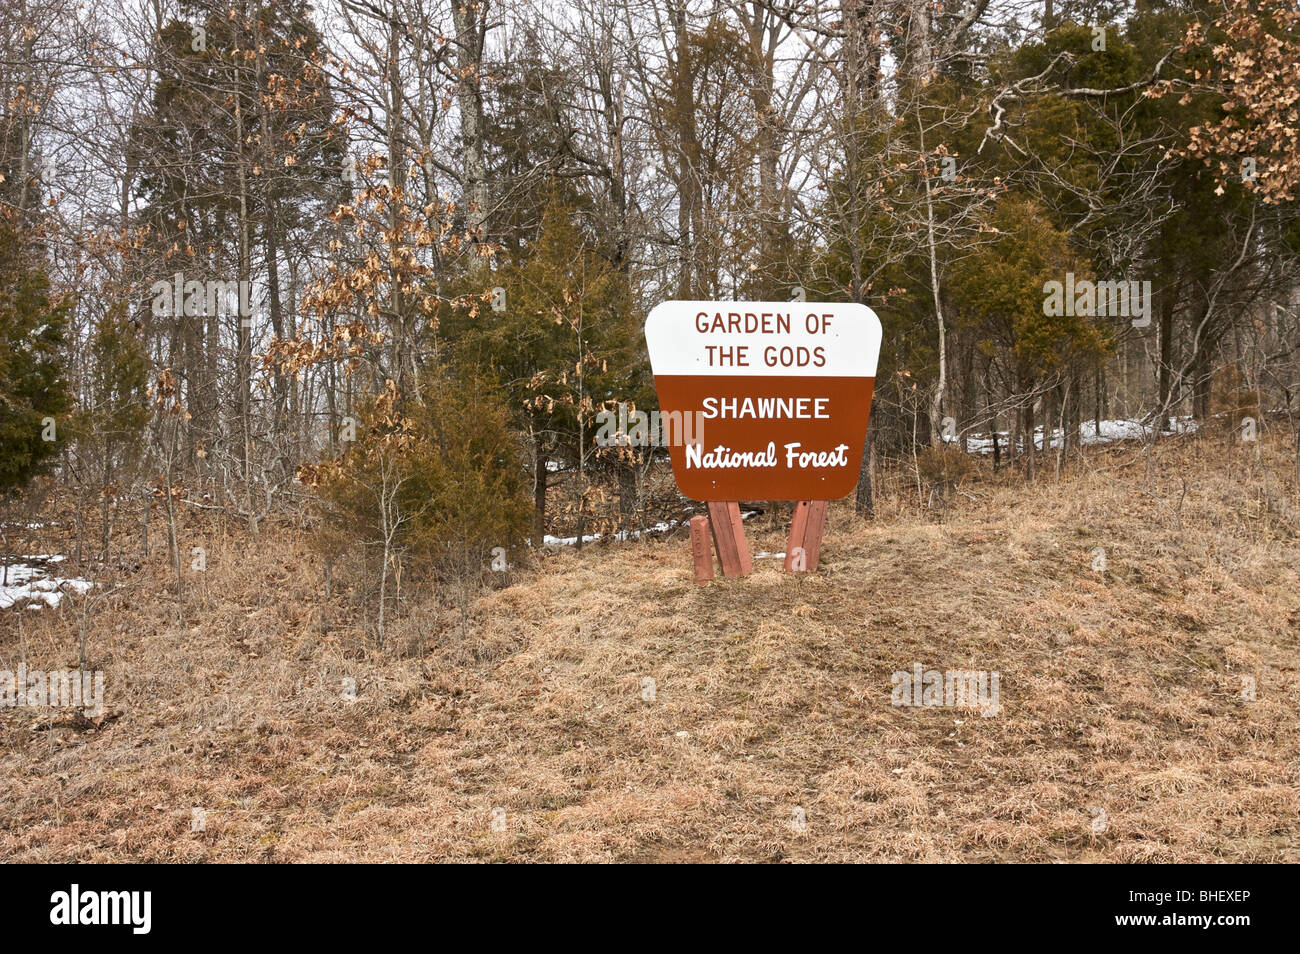 Garden Of The Gods Sign. Shawnee National Forest, Illinois USA   Stock Image